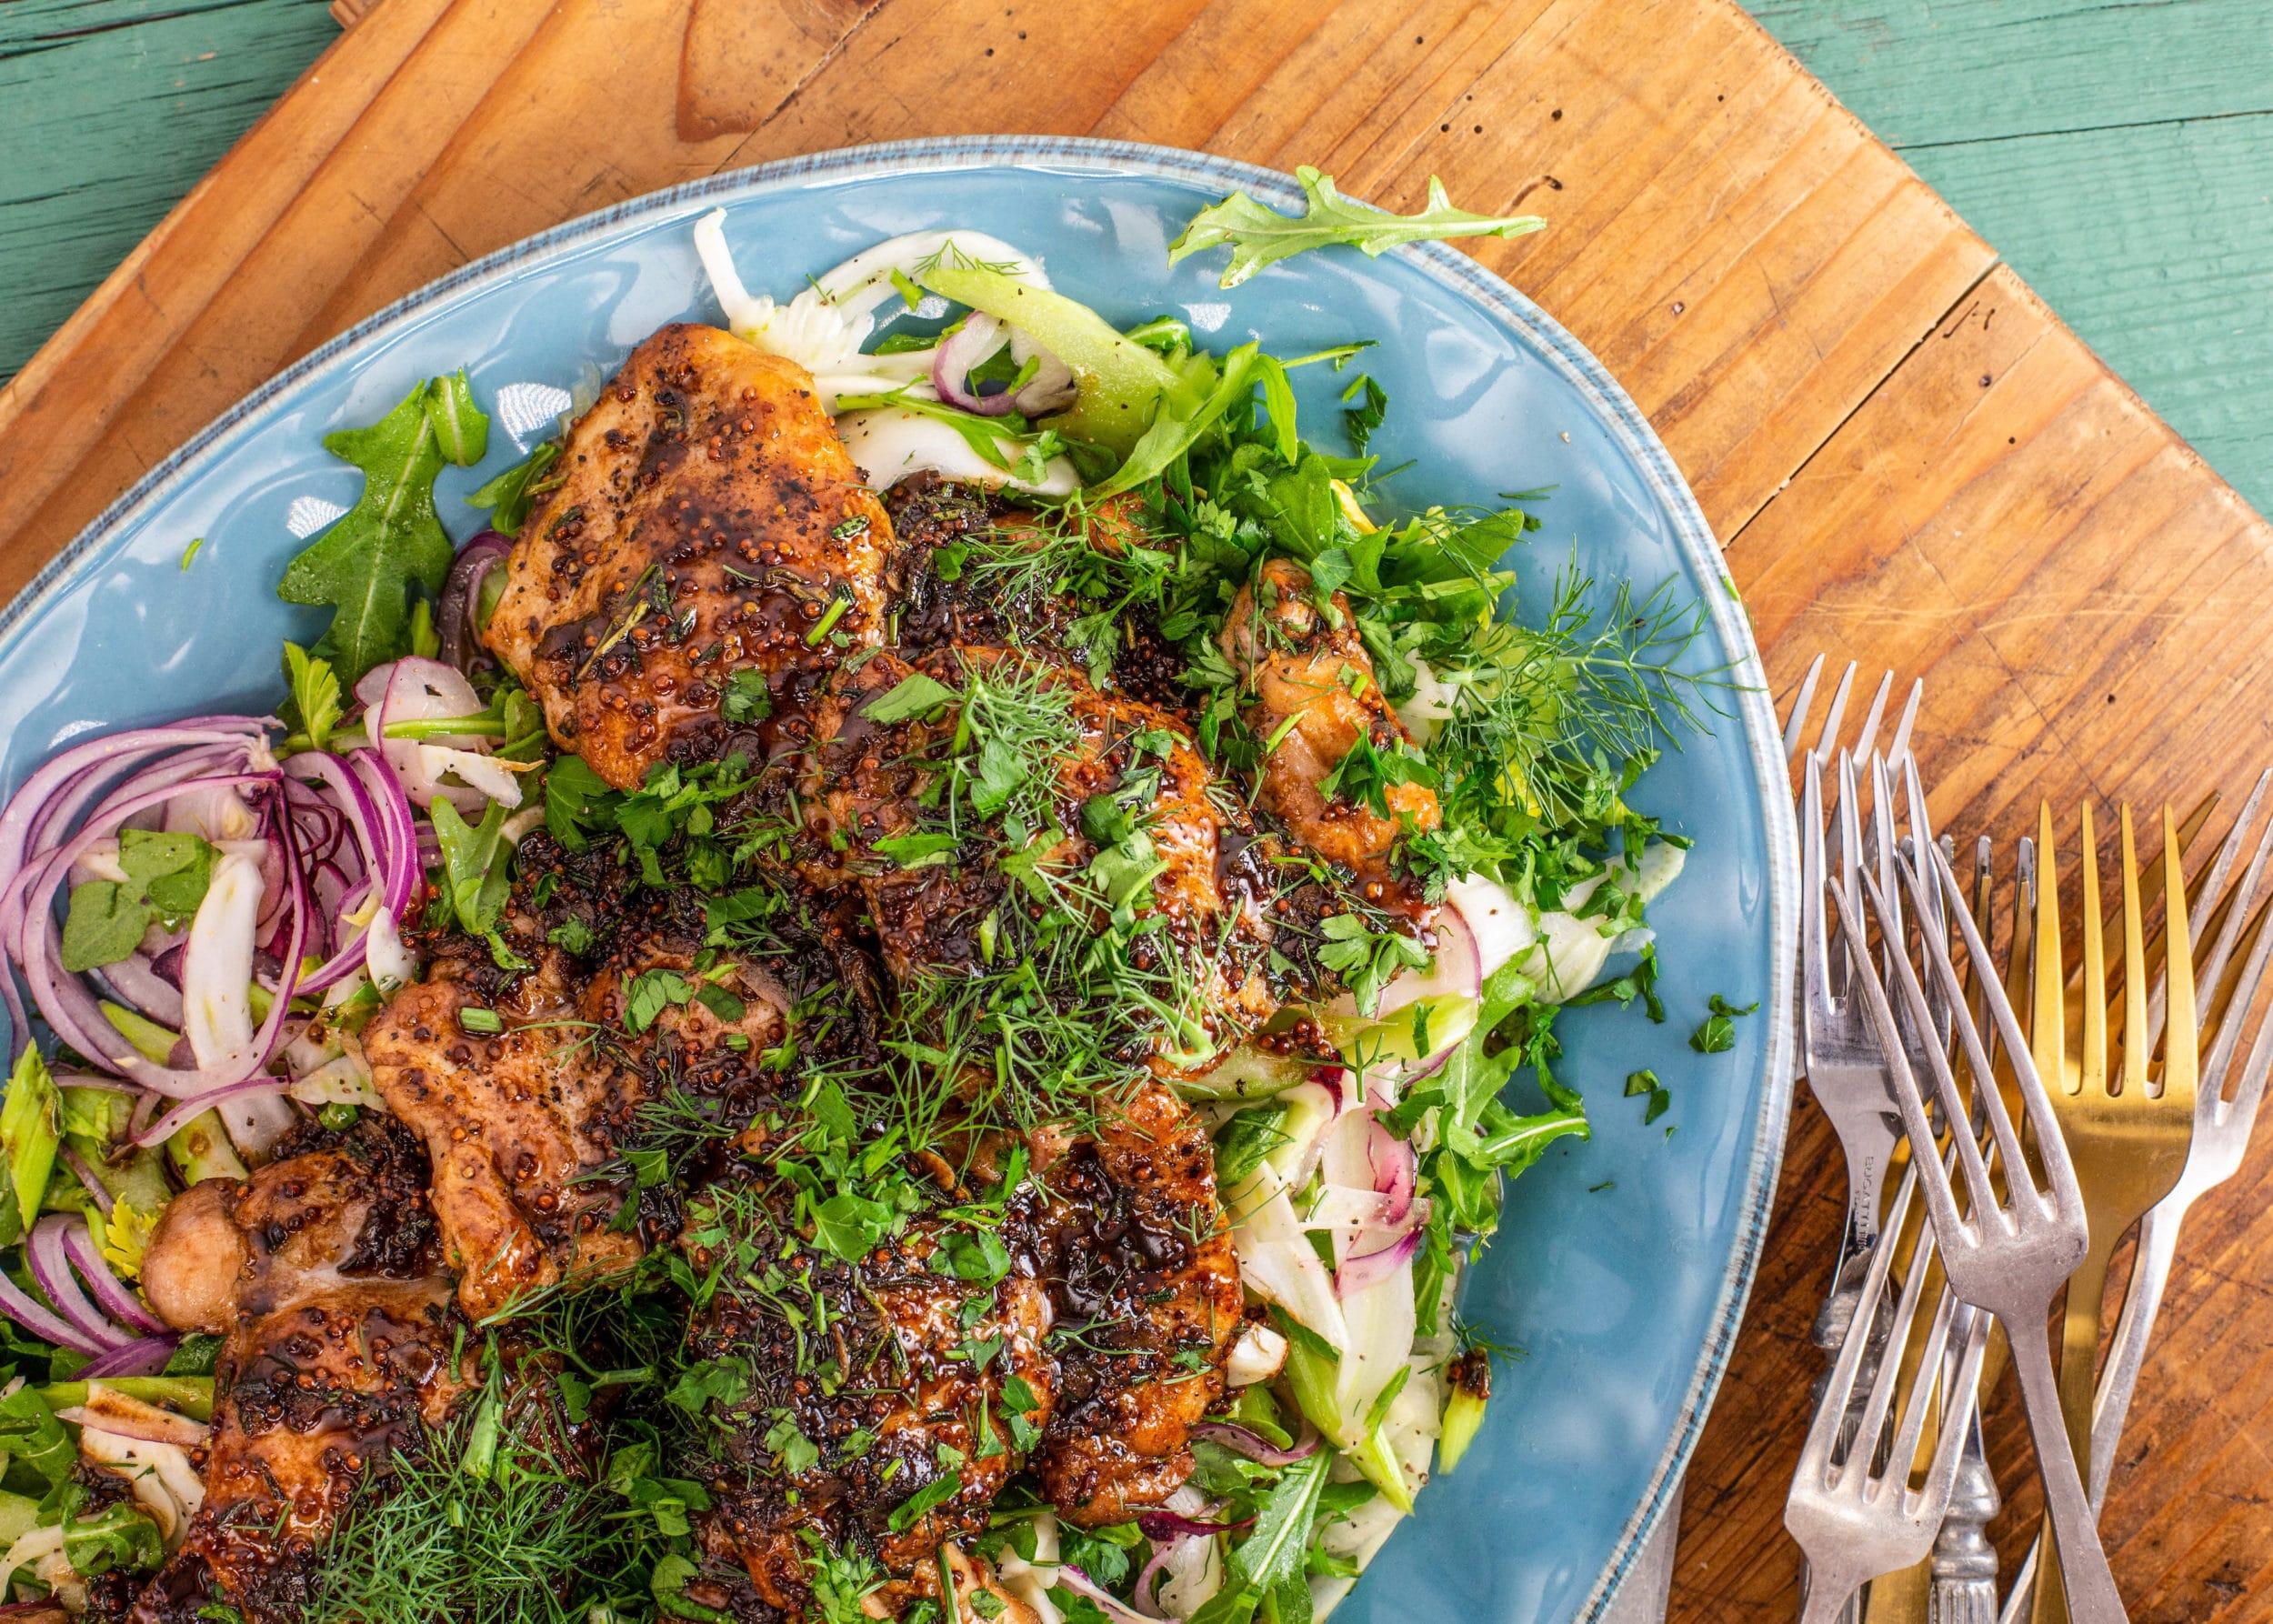 Rachael's Balsamic-Glazed Chicken with Fennel & Celery Slaw